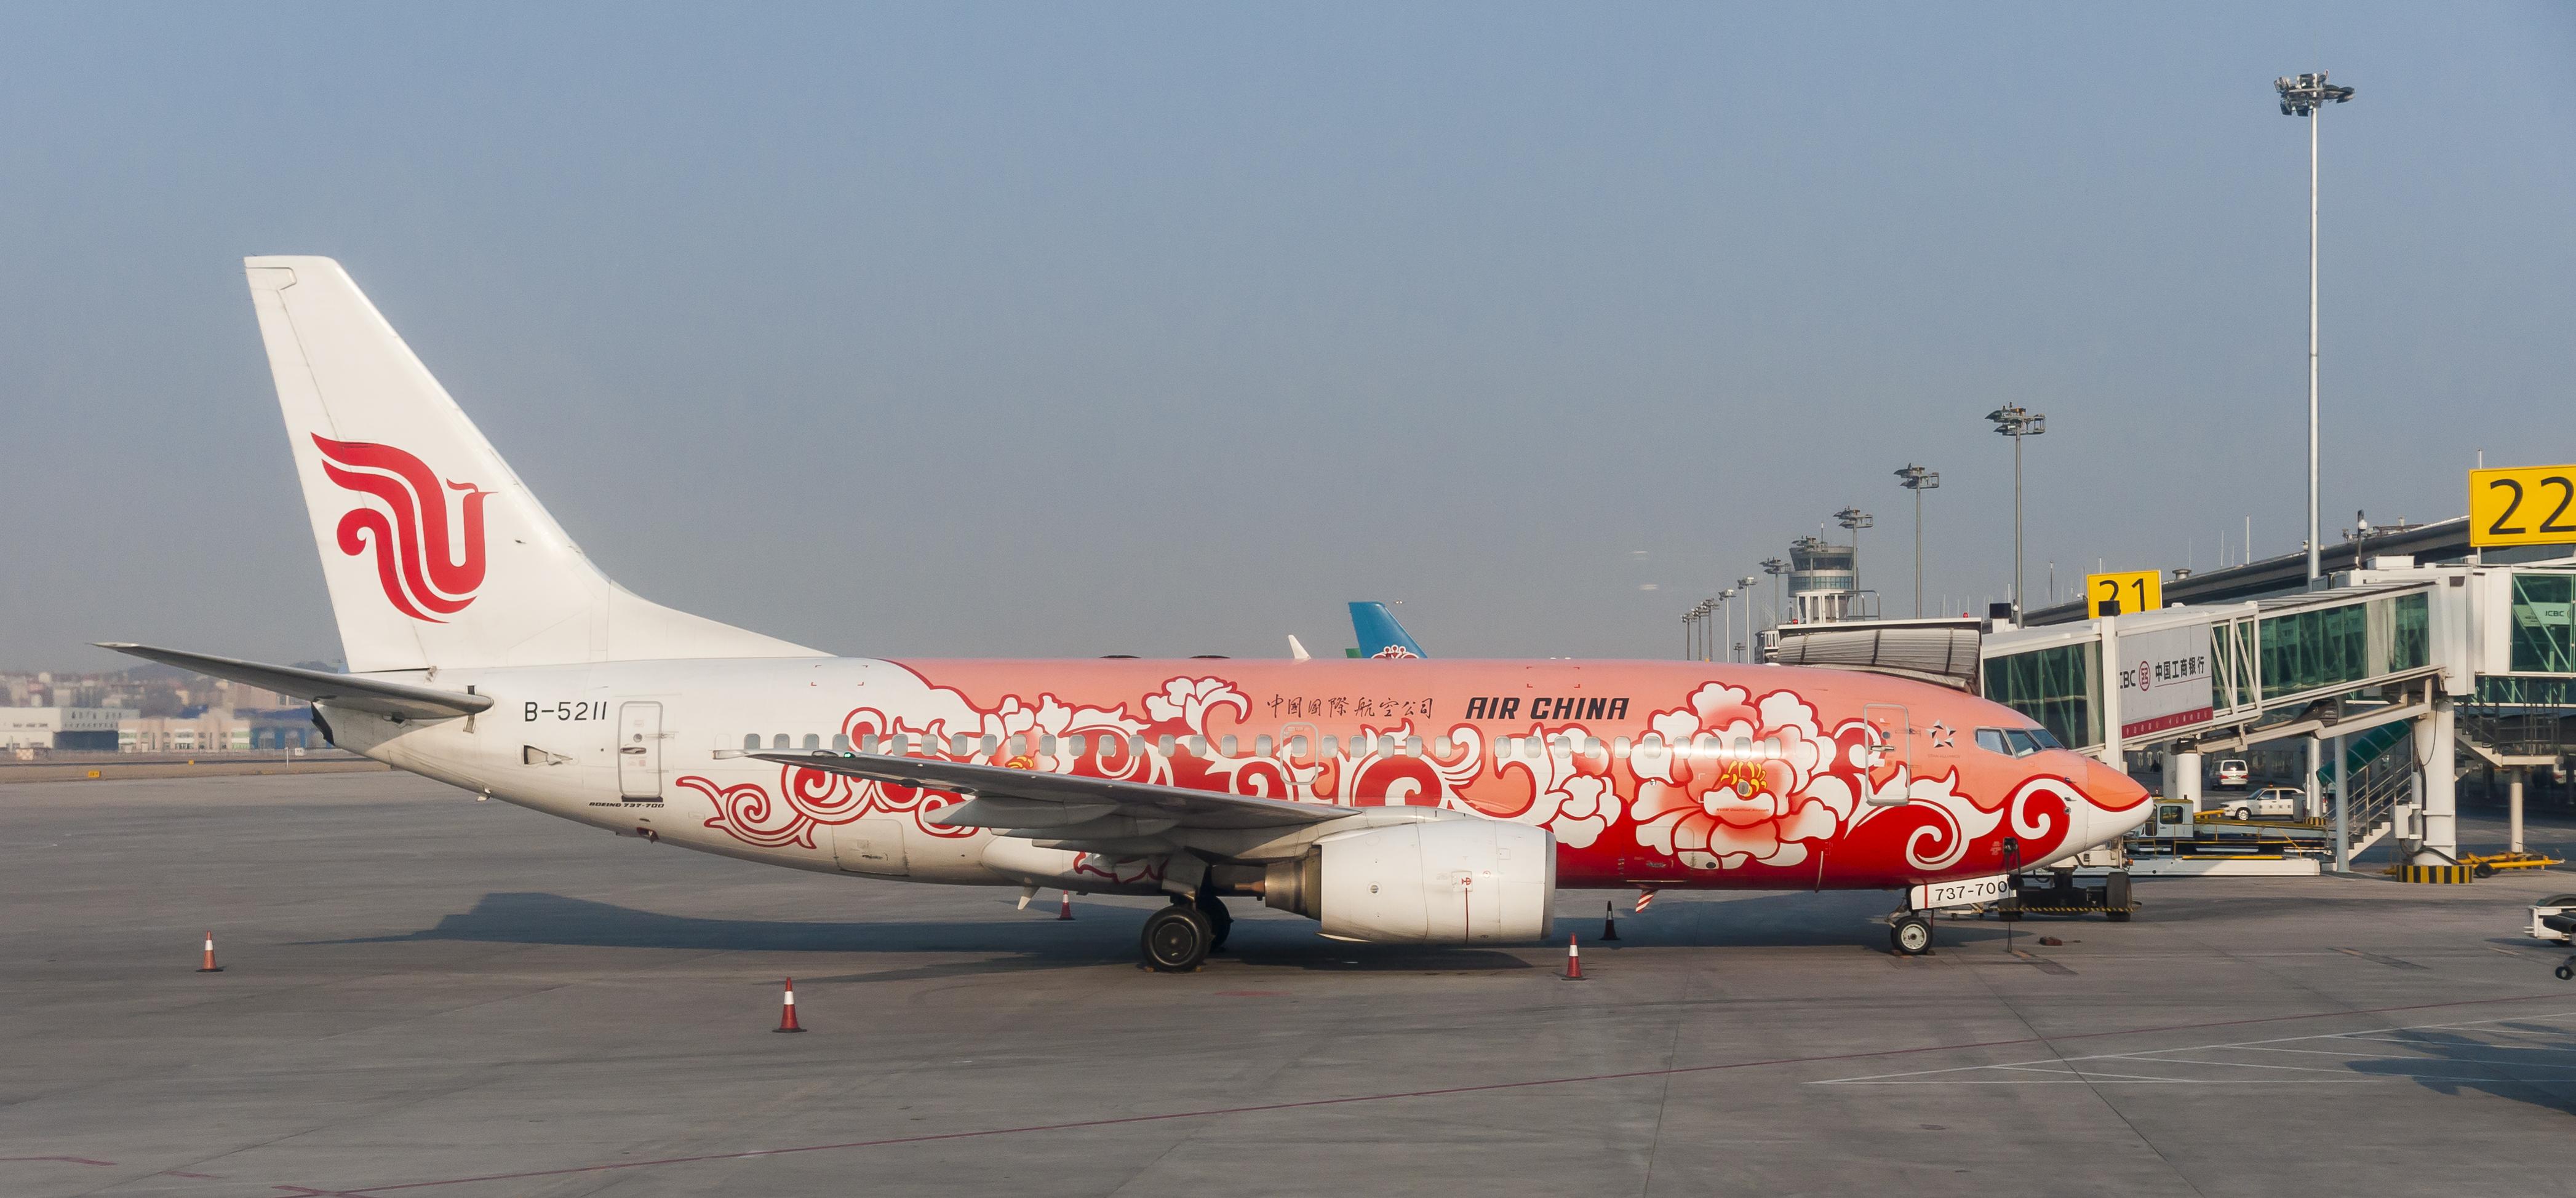 Resultado de imagen para airport of China